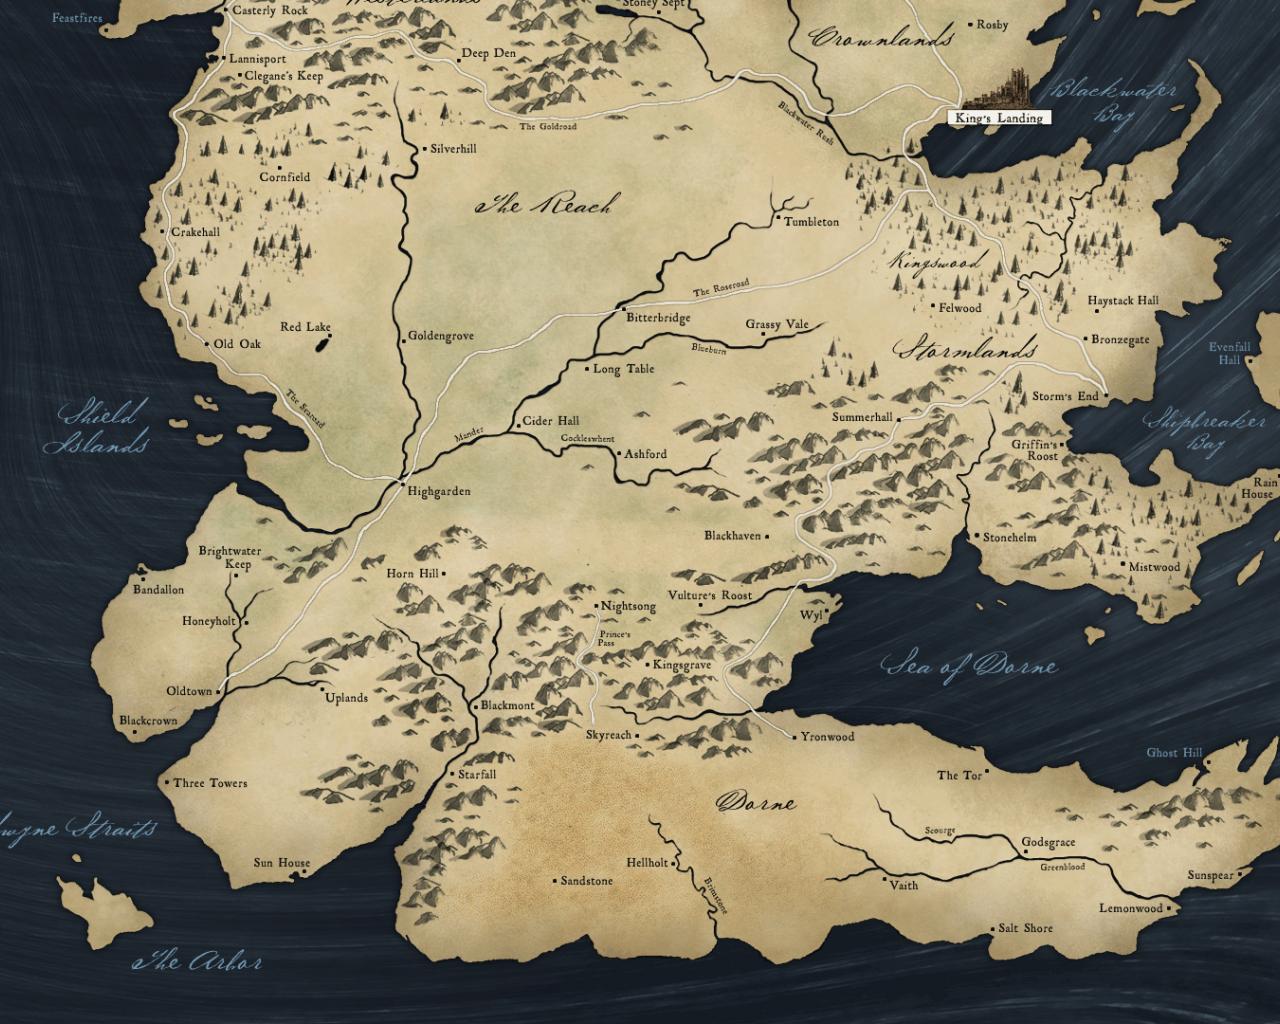 Free Download Game Of Thrones No Book Spoilers Season 1